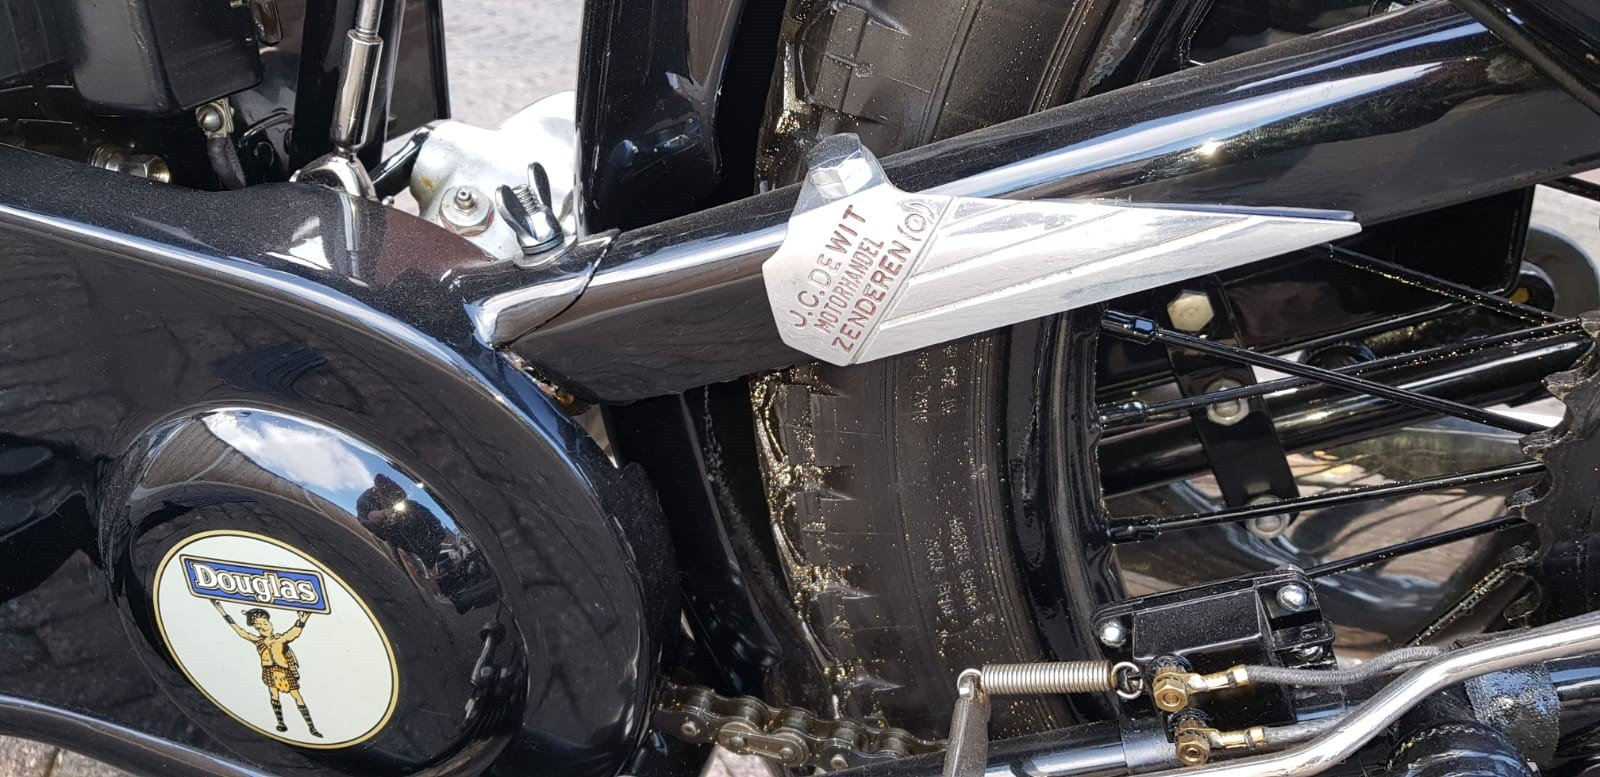 Douglas 1929 600cc SOLD (picture 3 of 6)